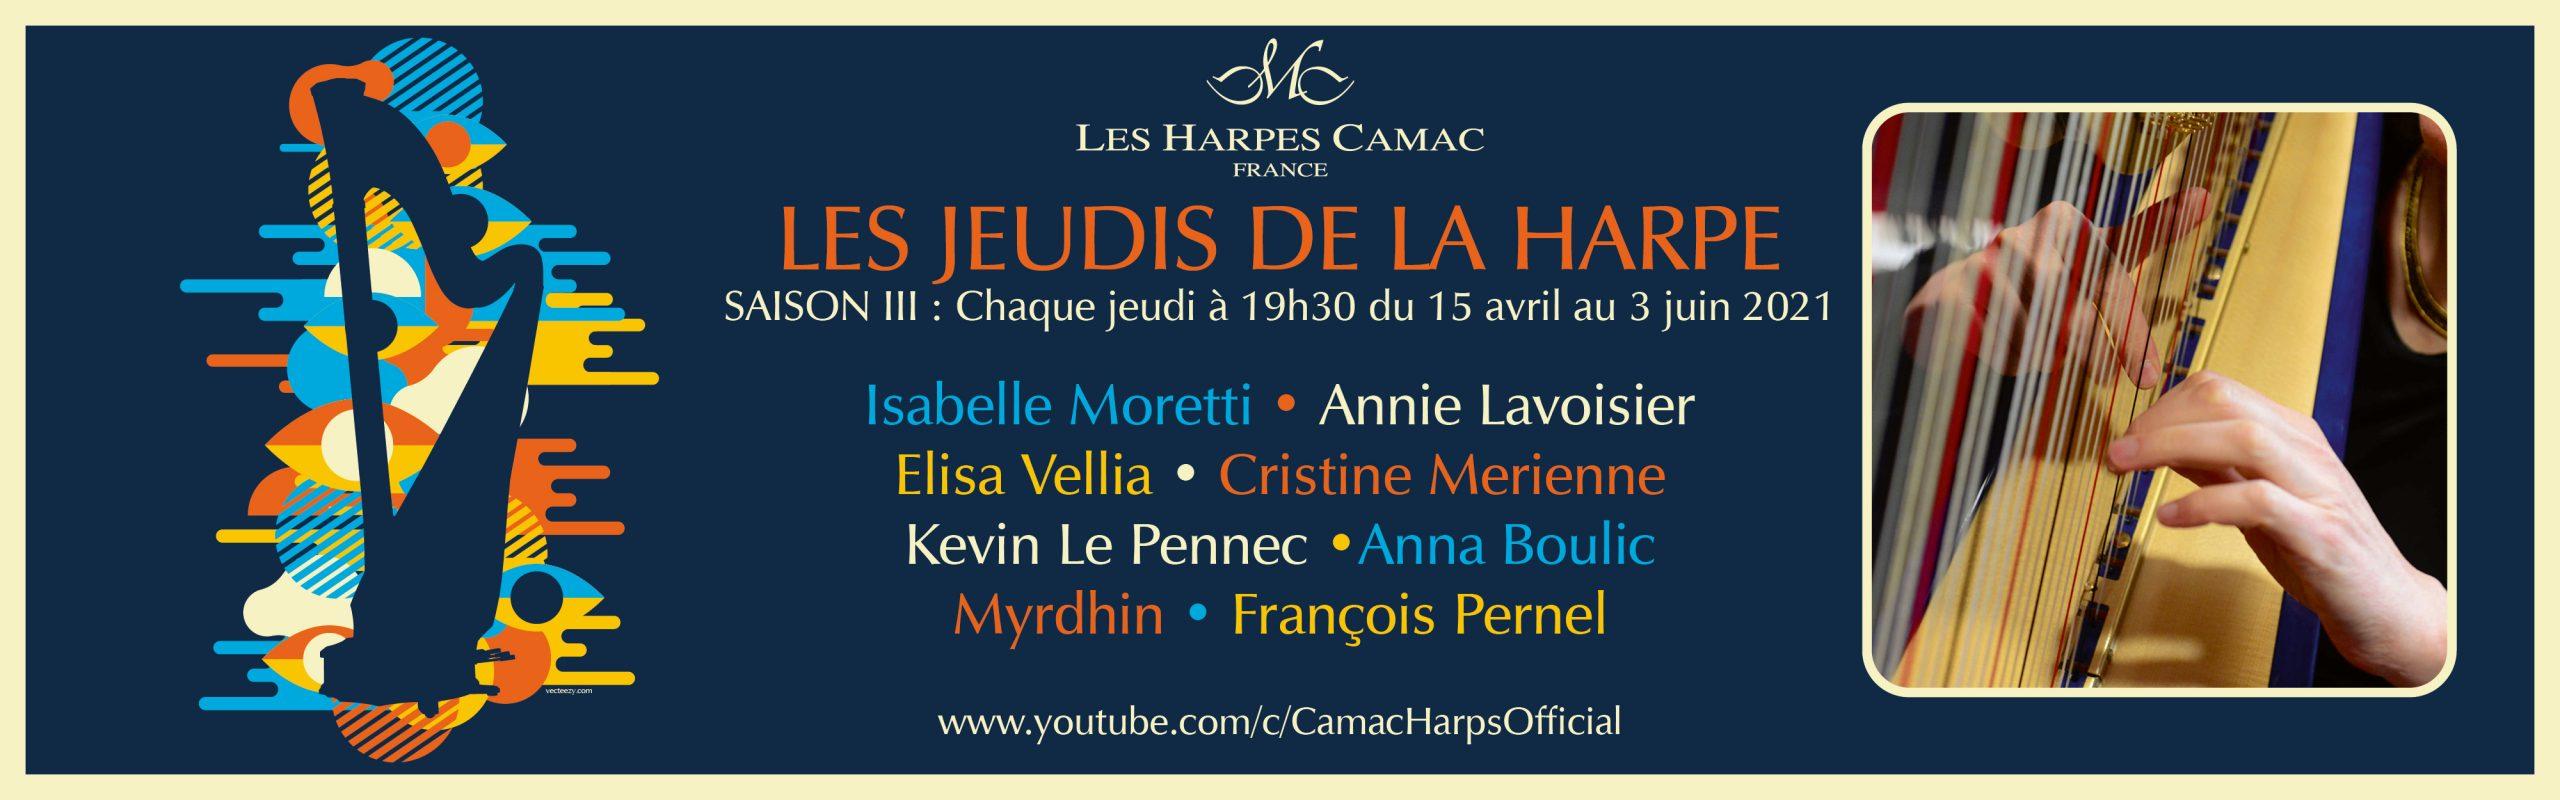 Les Jeudis de la Harpe, Saison III